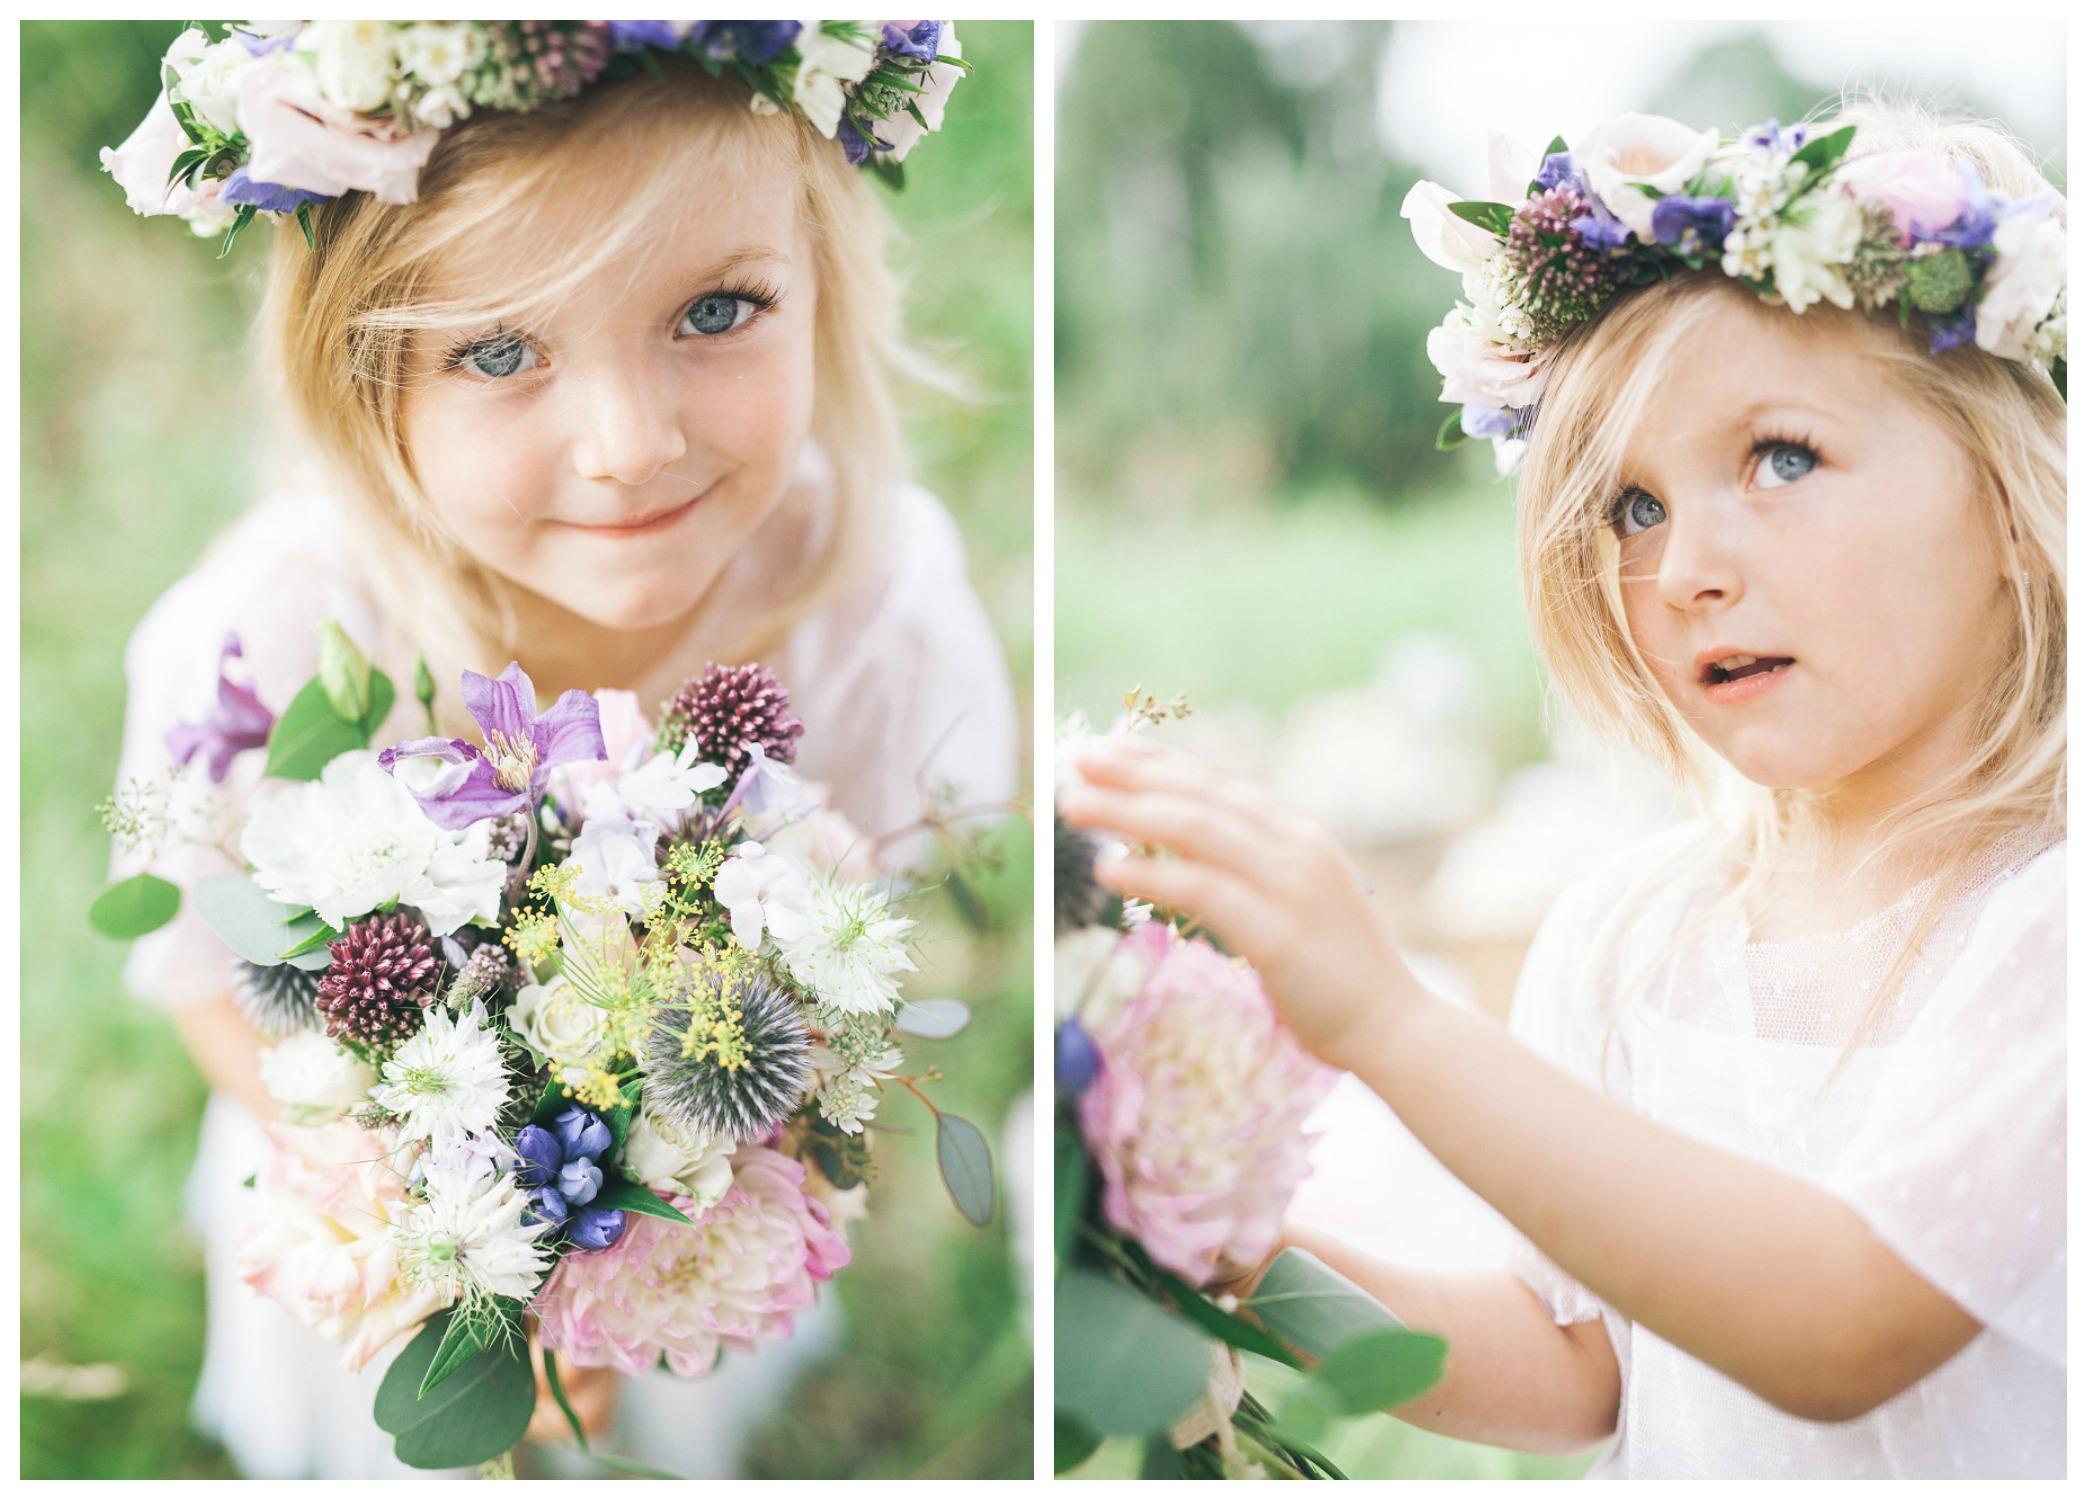 lovetralala_shooting-inspi-kiss-the-bride-festival-2016_09